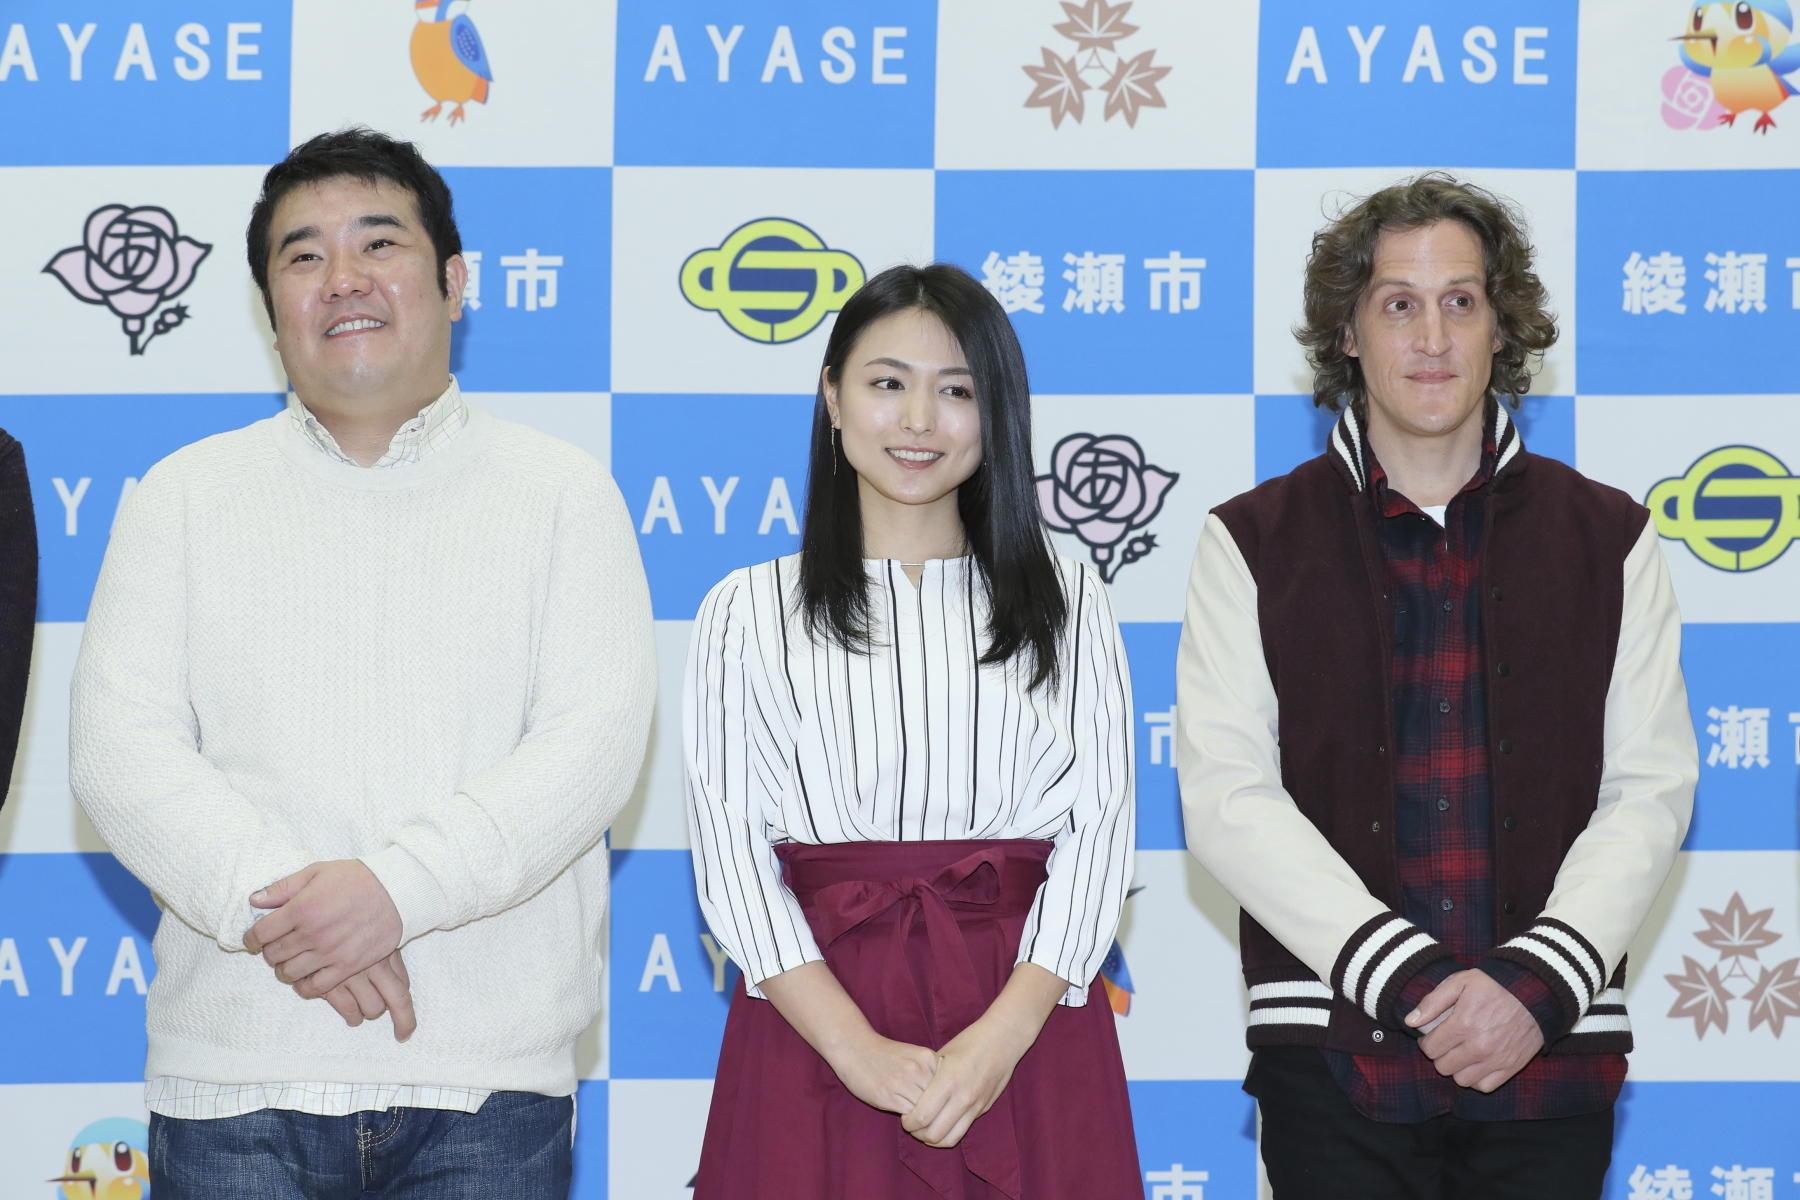 http://news.yoshimoto.co.jp/20190115224535-2298659082f732a2e37a9d55be3716a9faace317.jpg